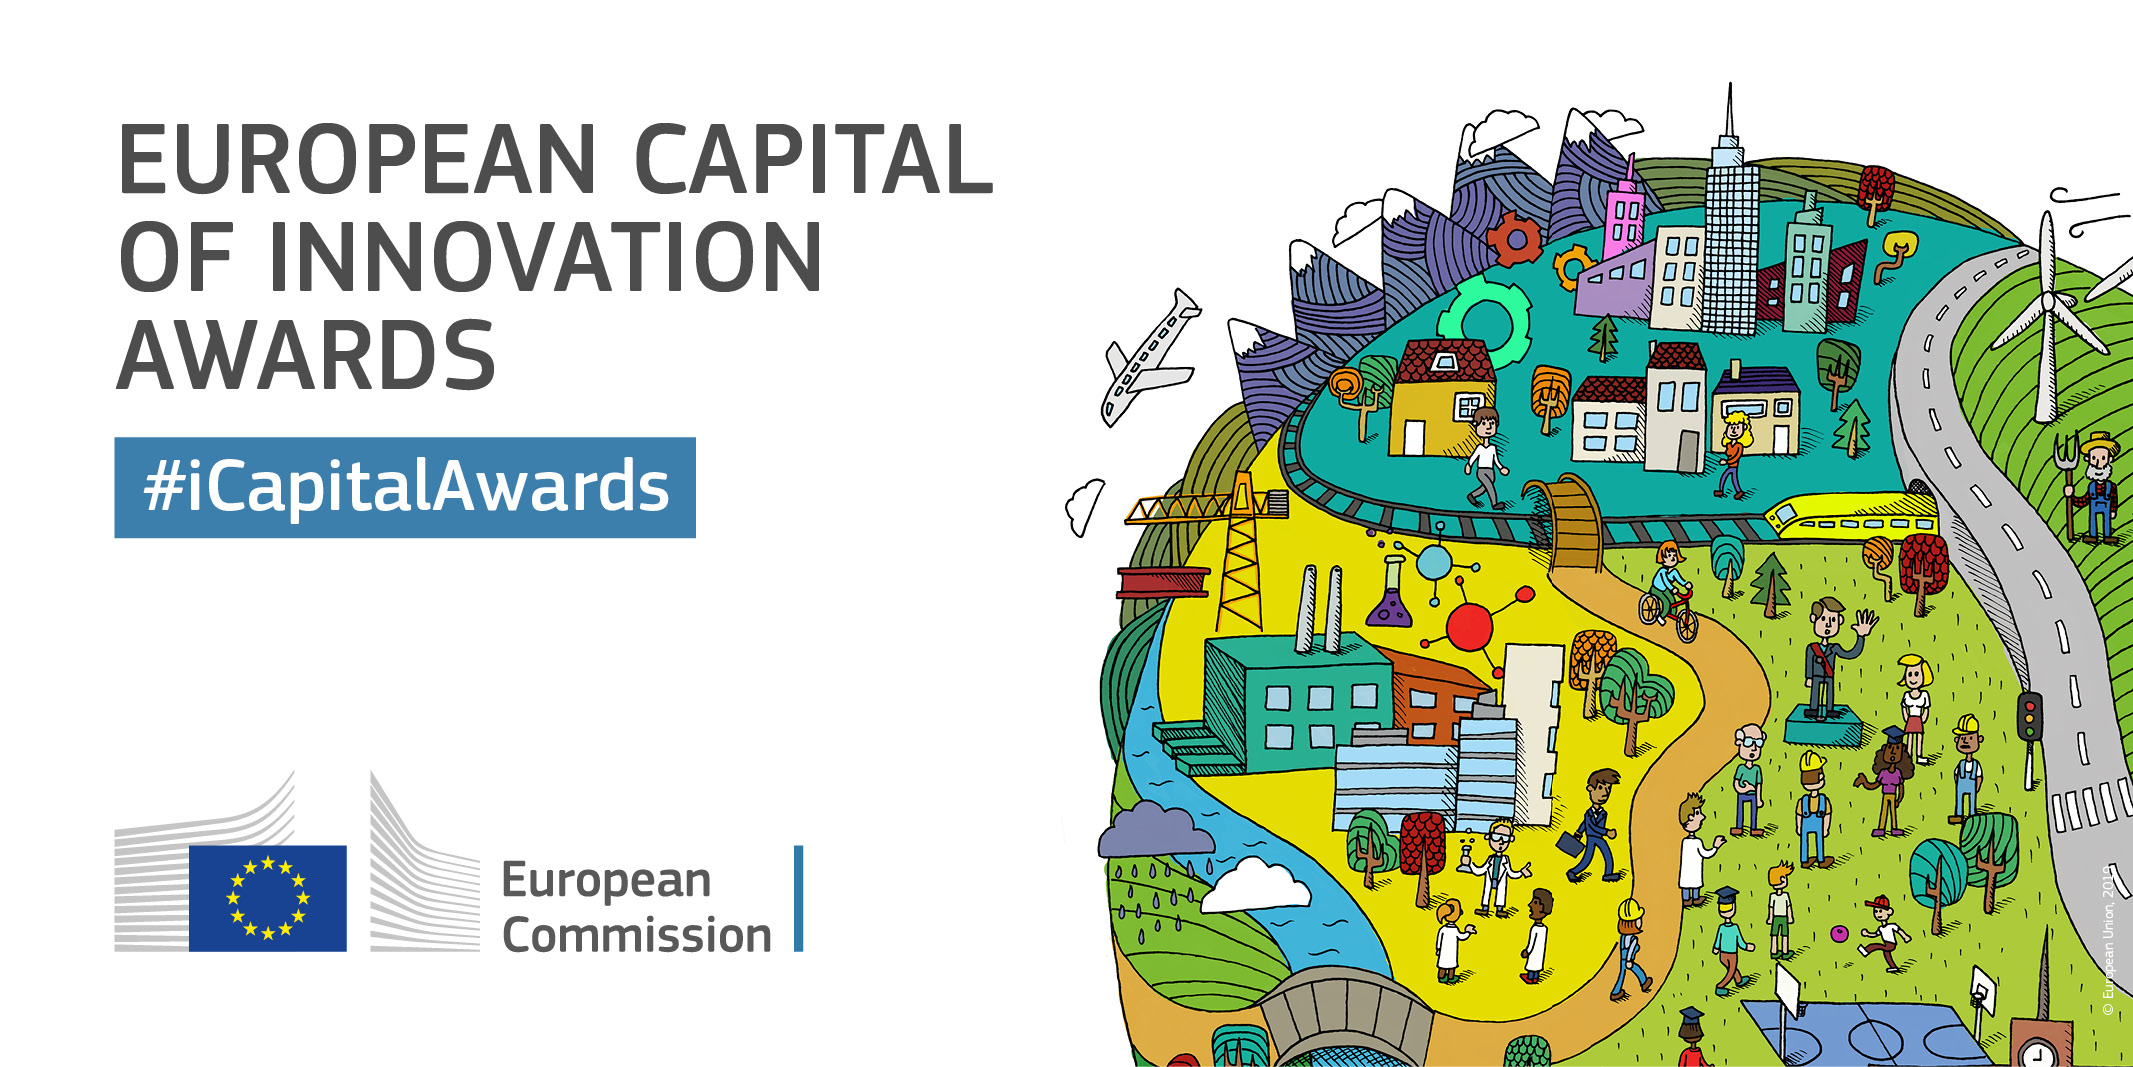 European Capital Of Innovation Award 2019 : Lyon encequiconcerne Capitale Union Européenne